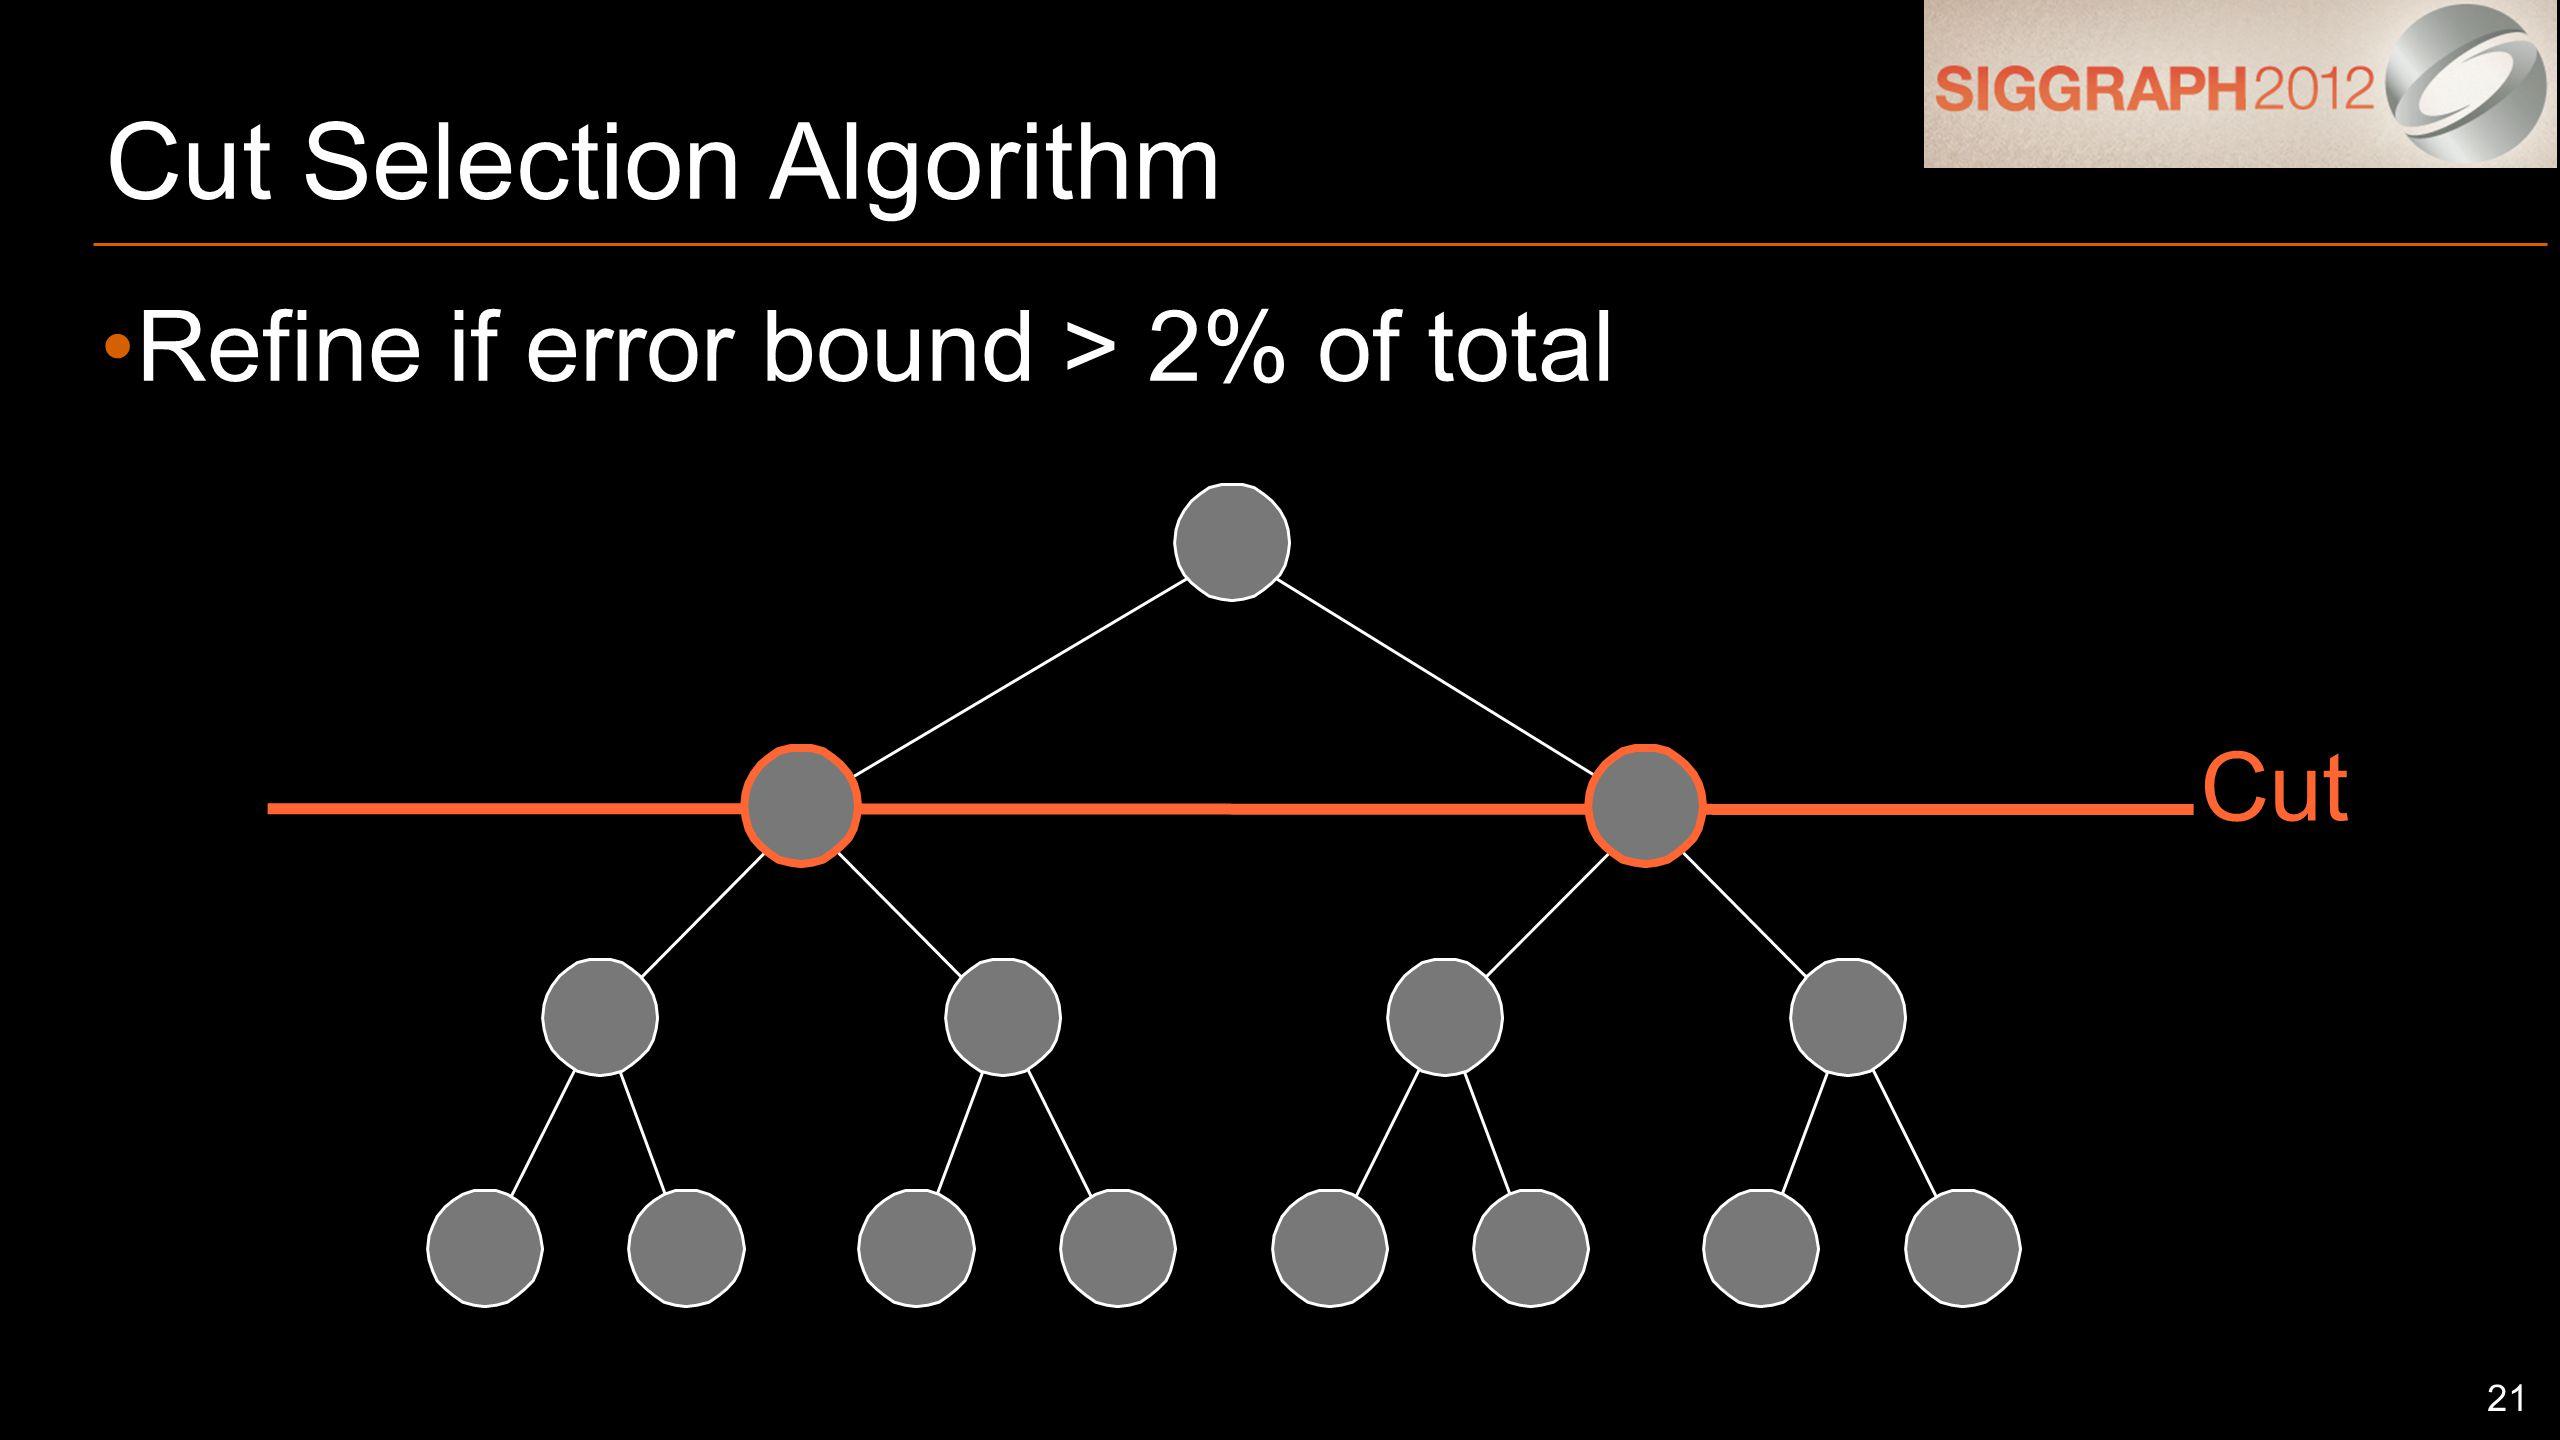 21 Cut Selection Algorithm Refine if error bound > 2% of total Cut